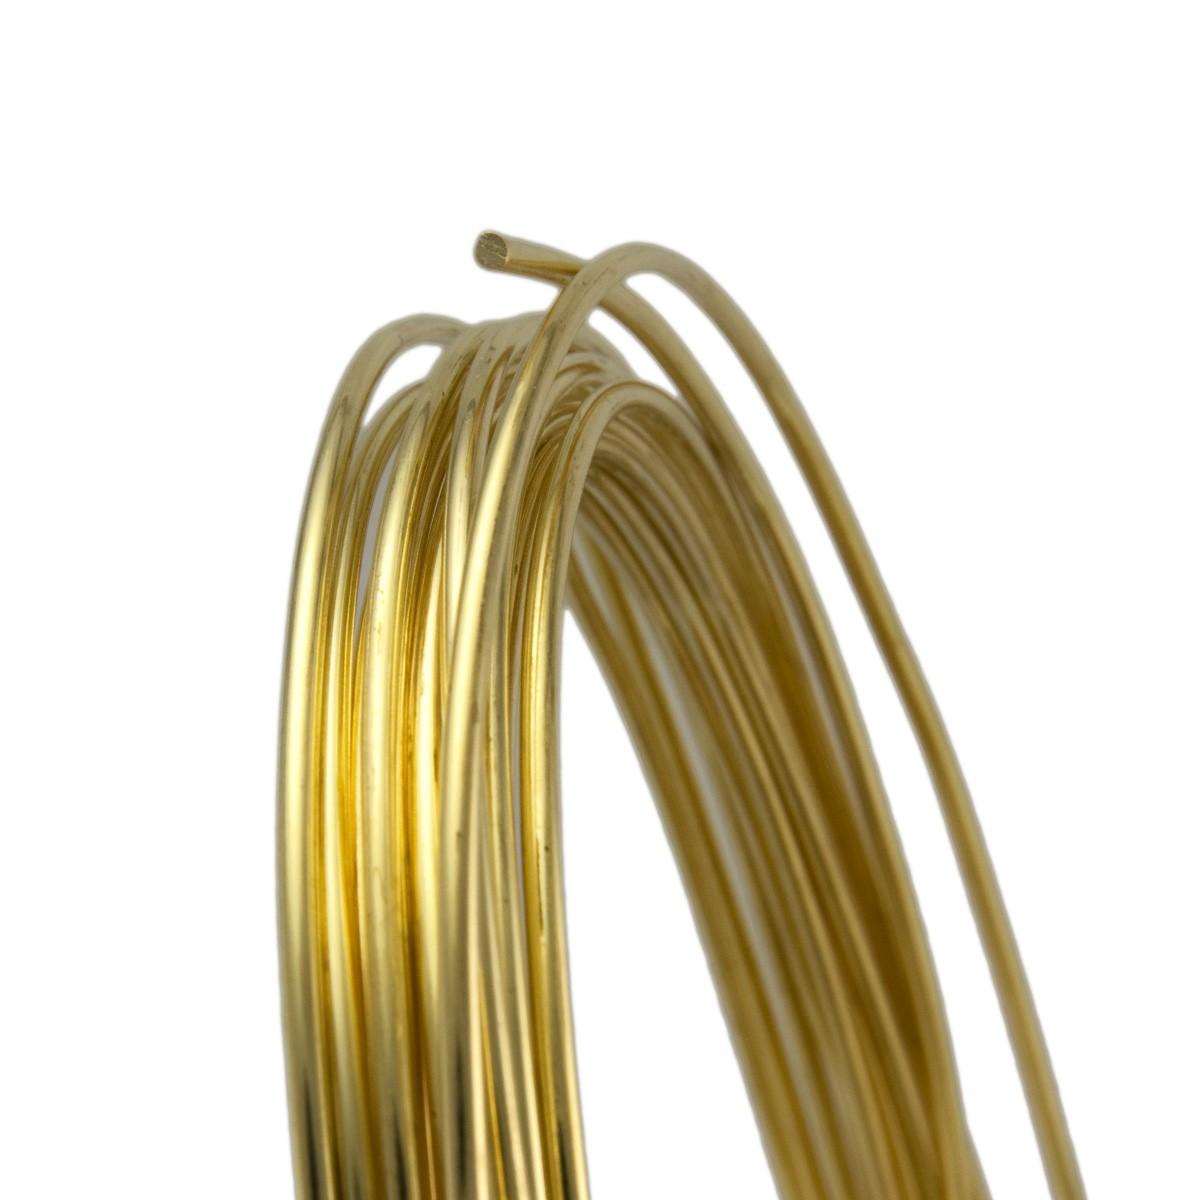 20 Gauge Round Half Hard Yellow Brass Wire: Wire Jewelry | Wire ...